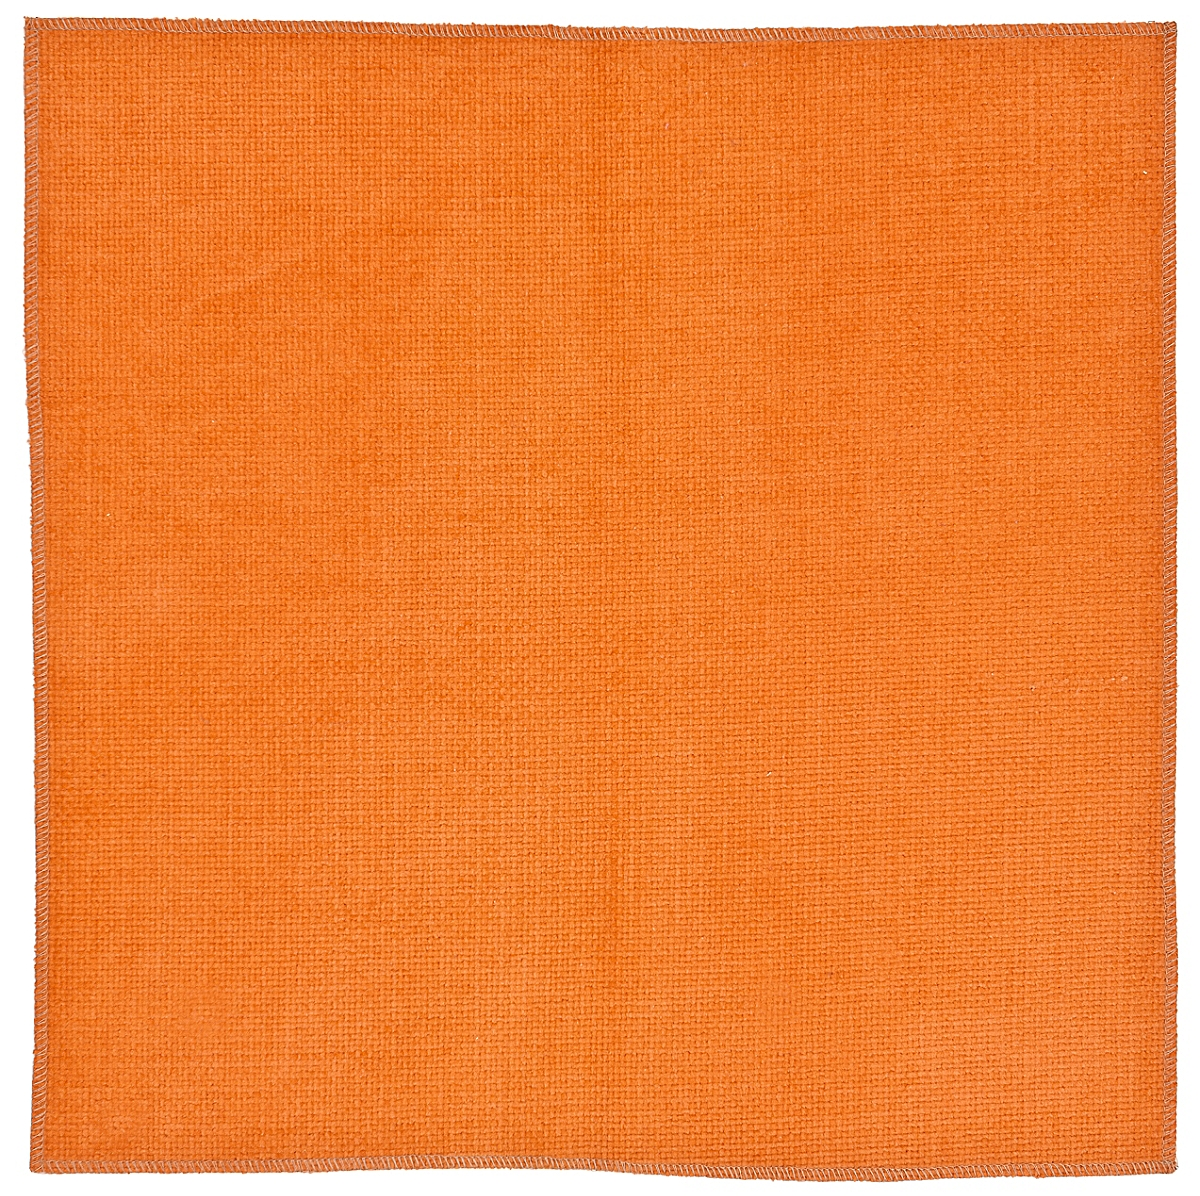 Luxe Yuri: Mango (fabric yardage)